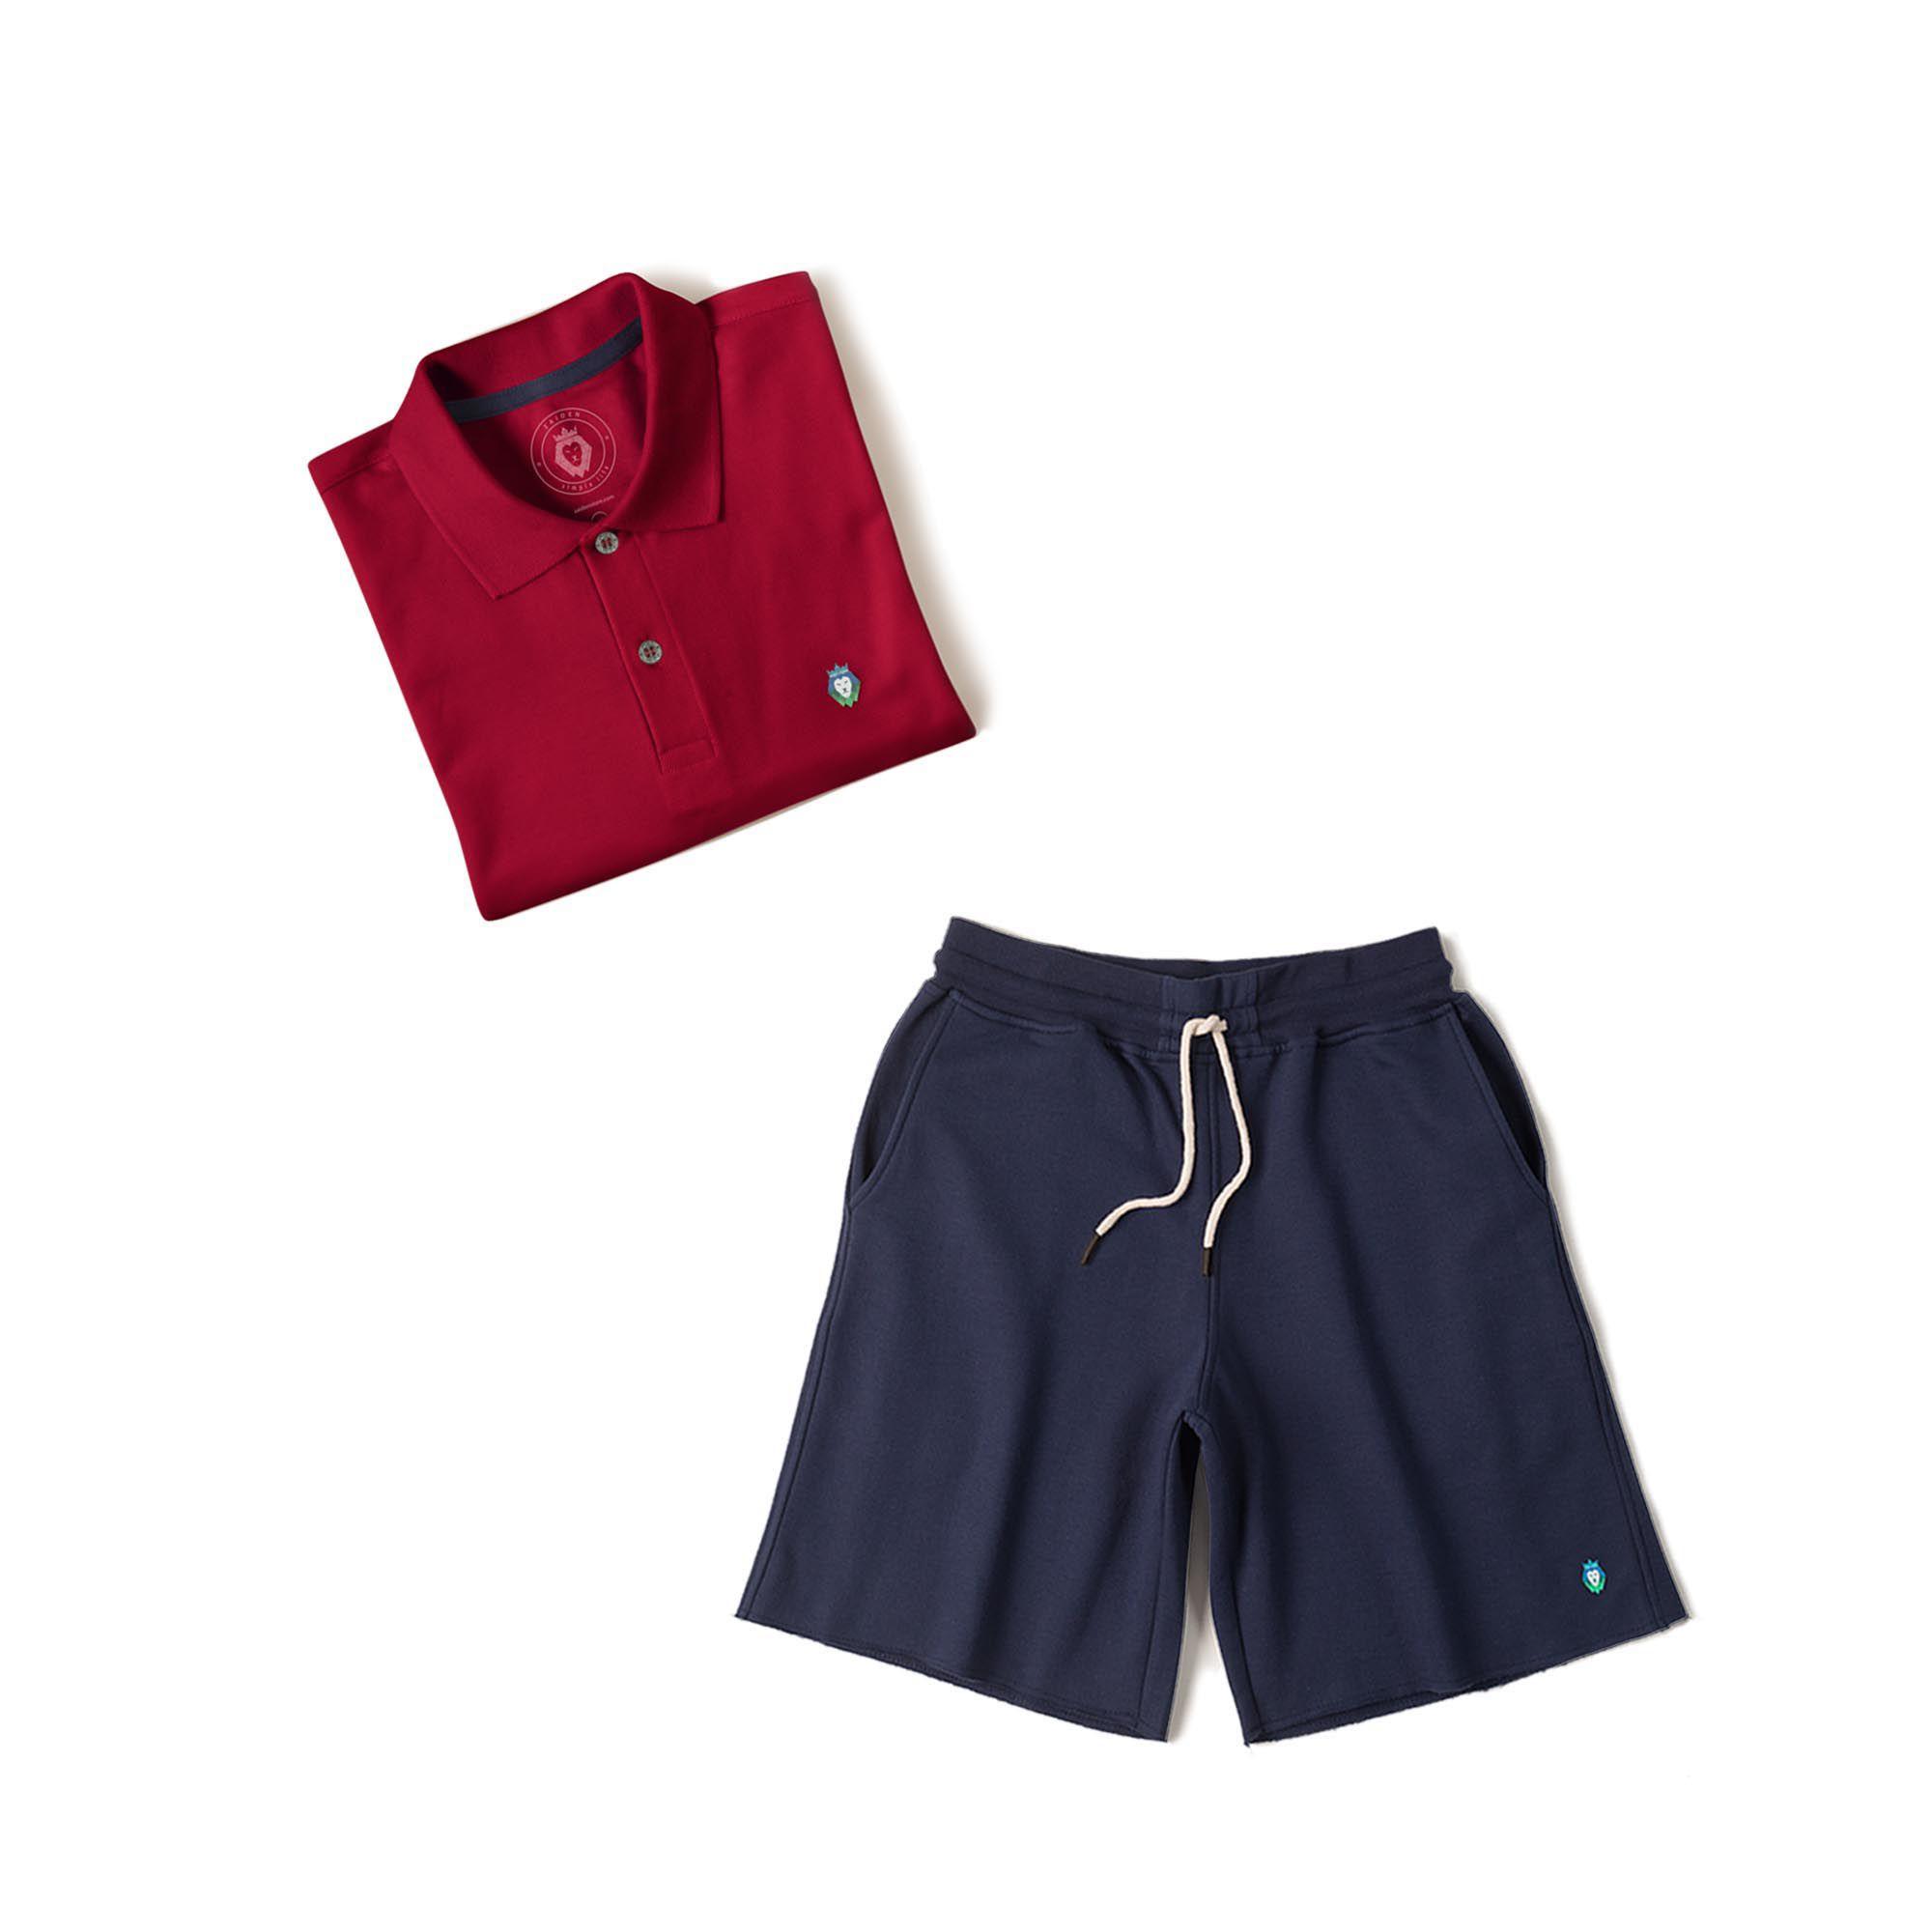 Kit 1 Bermuda Basic Azul Marinho + 1 Camisa Polo Style Bordô Zaiden Masculina